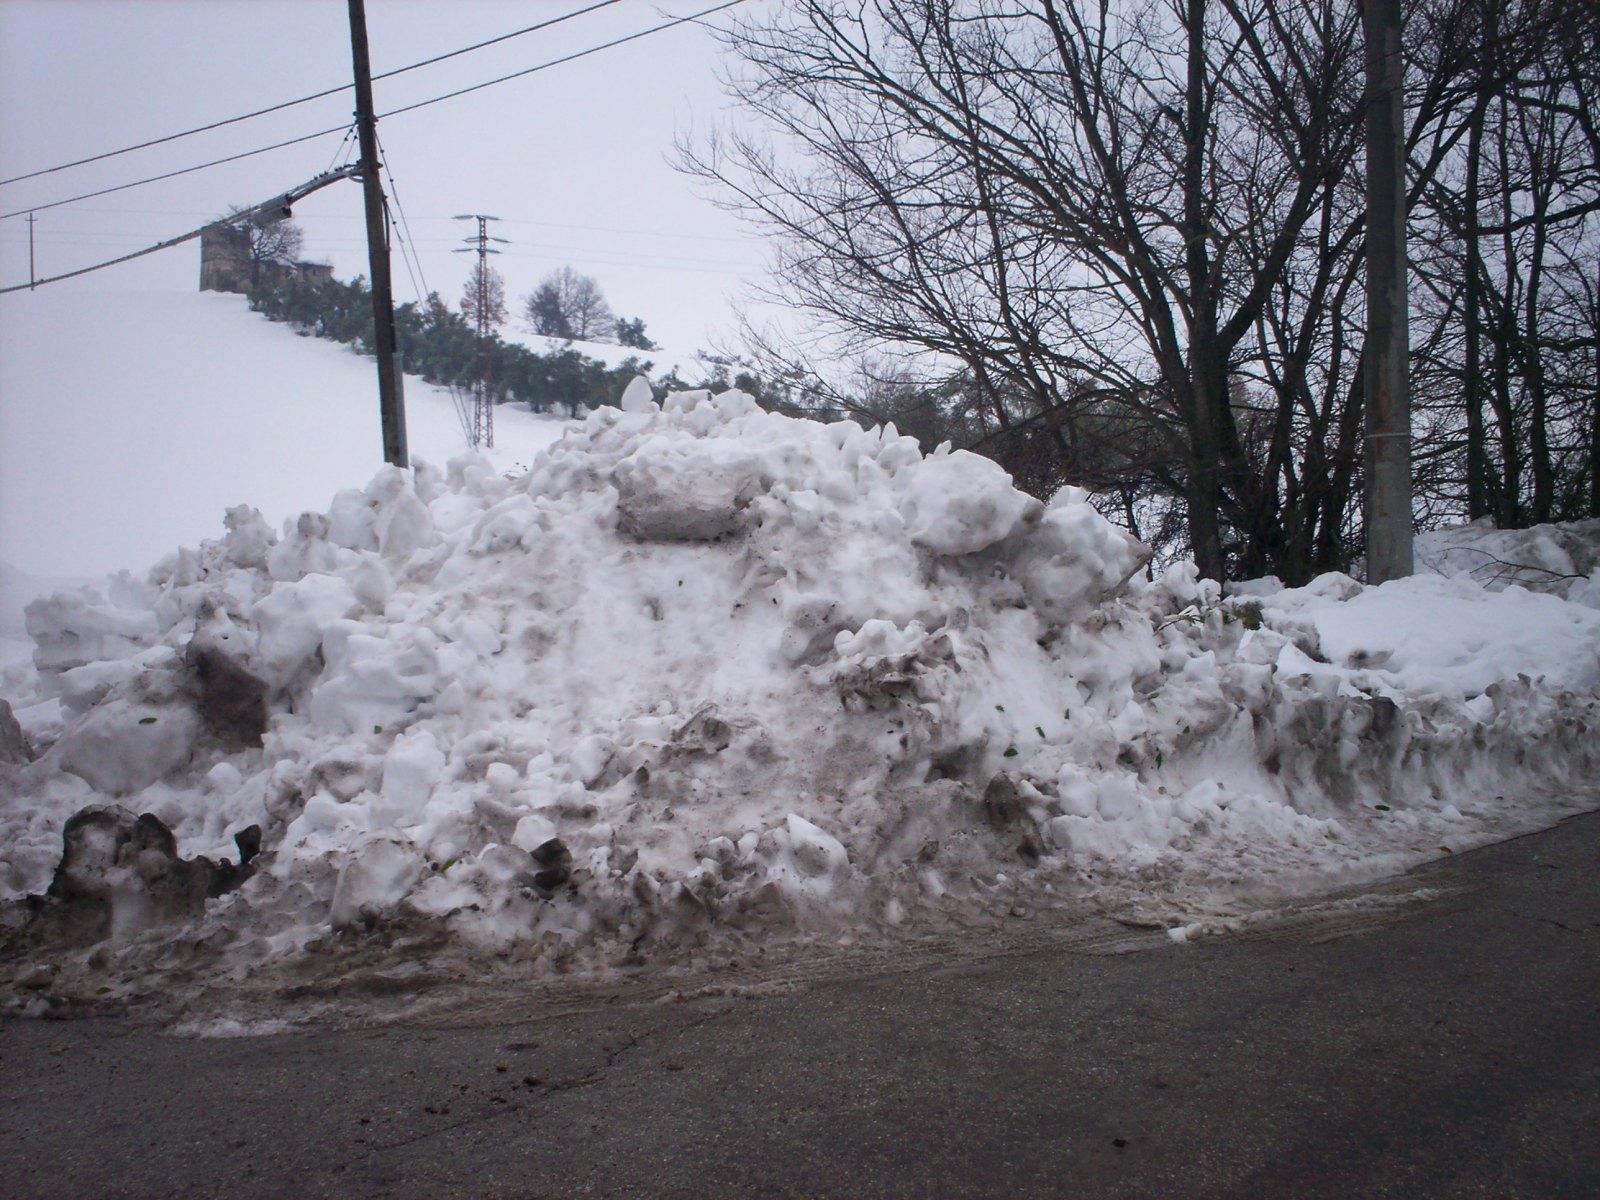 2017 nevicata straordinaria Teramano